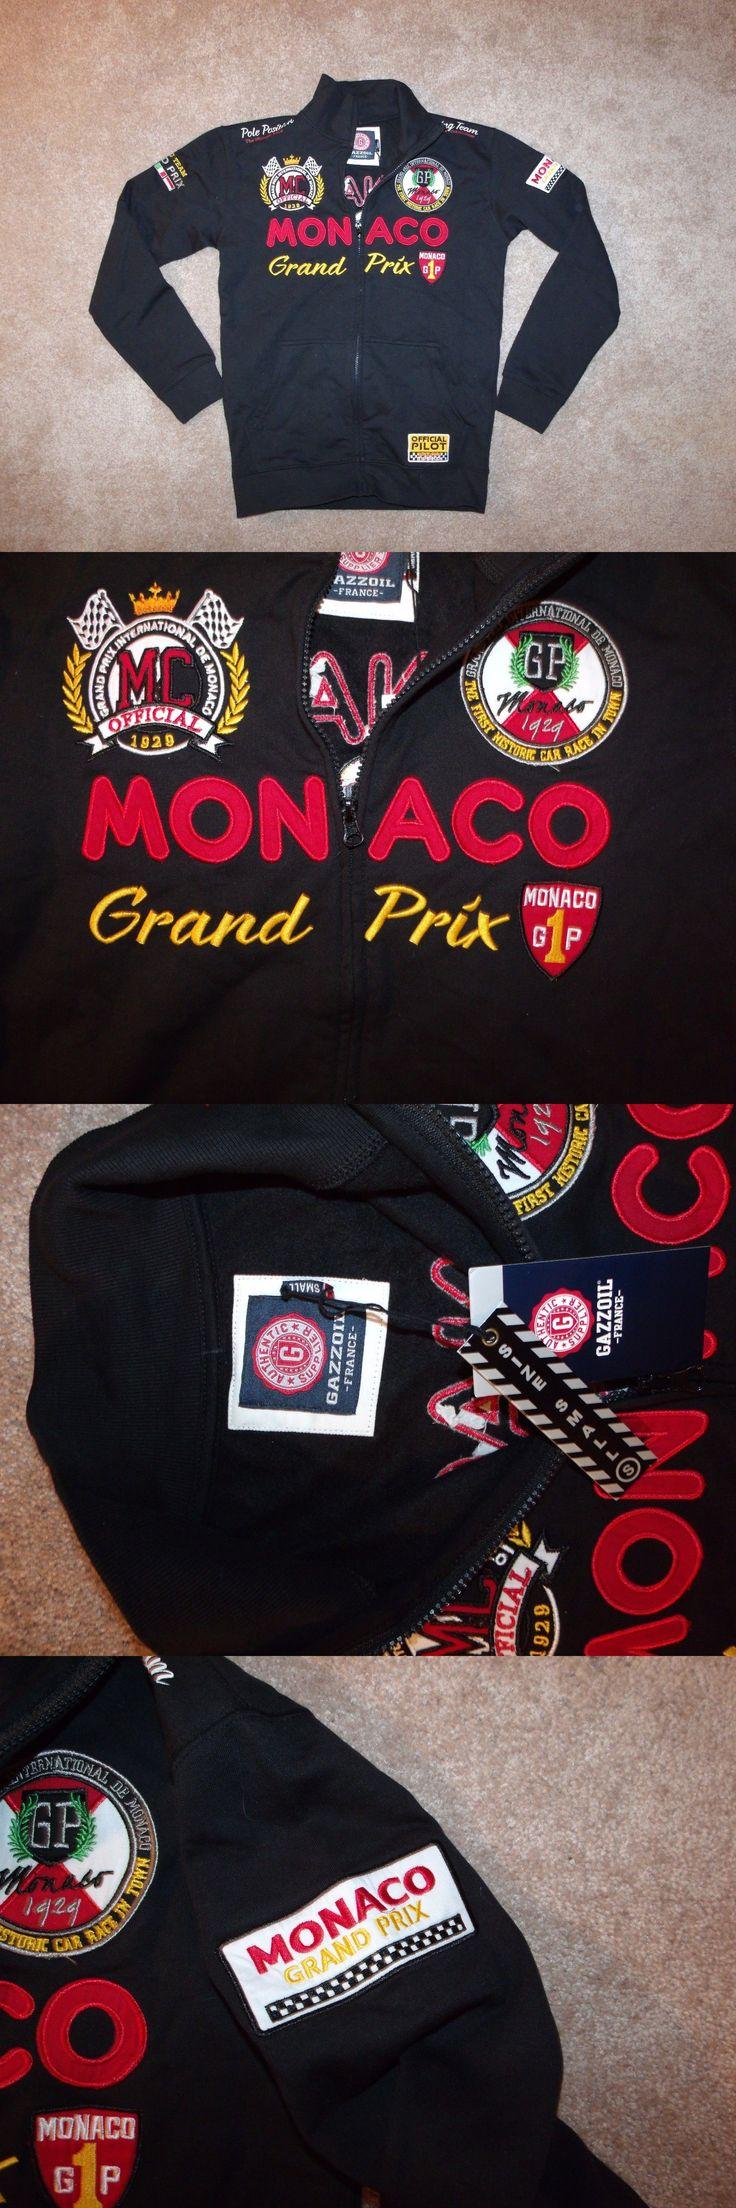 Racing-Formula 1 2876: Nwt Gazzoil F1 Racing Grand Prix Monaco Sponsors Black Zip Jacket Sz. S -> BUY IT NOW ONLY: $37.49 on eBay!